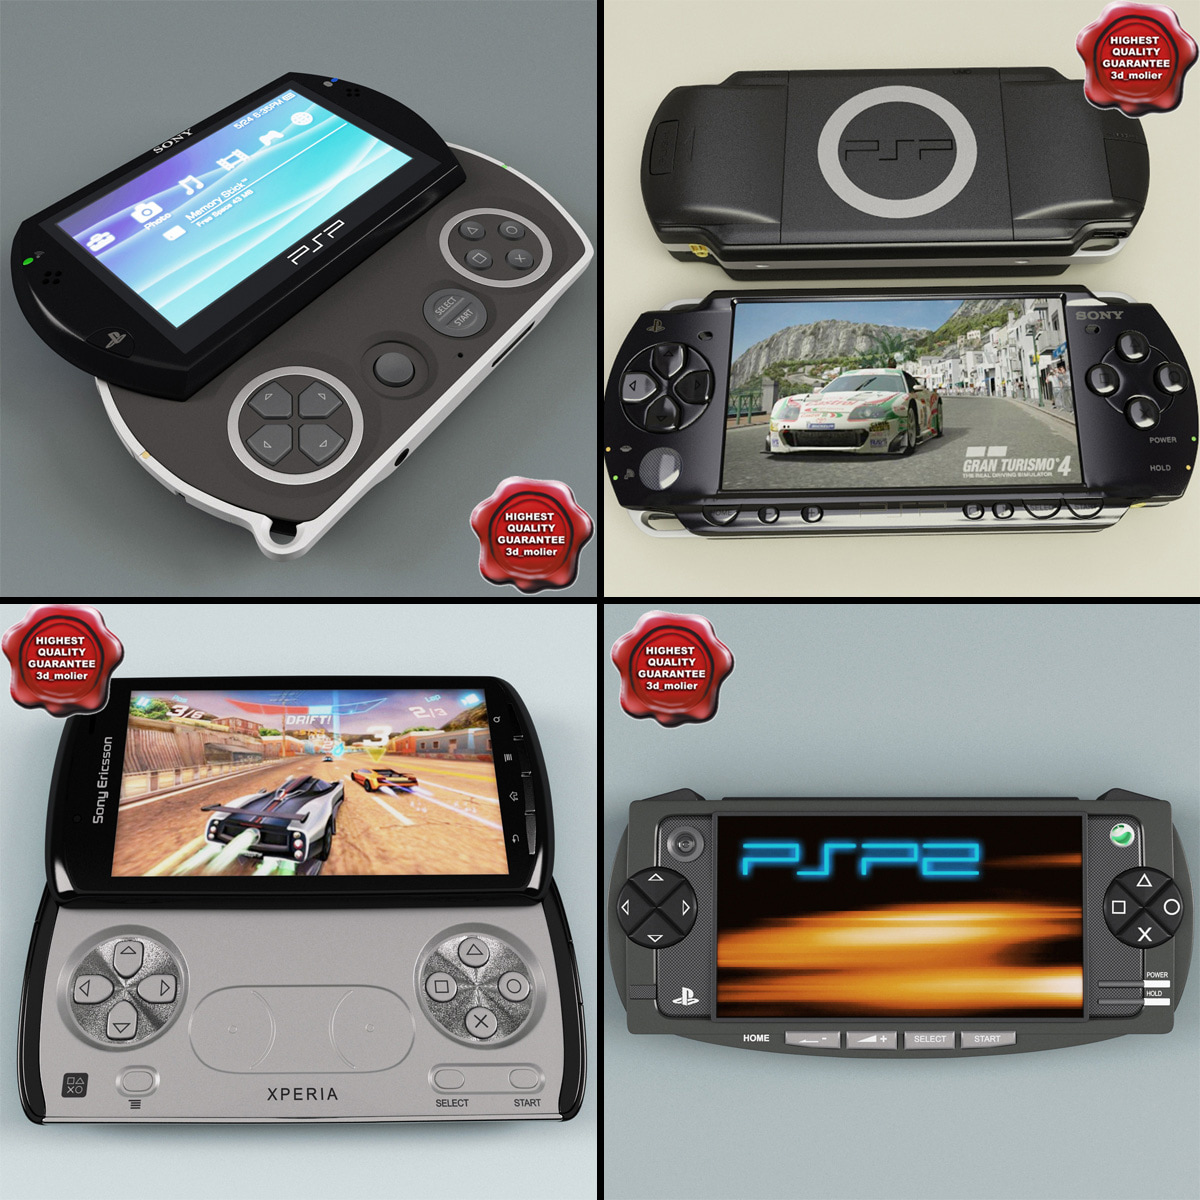 Portable_Game_Consoles_Collection_000.jpg